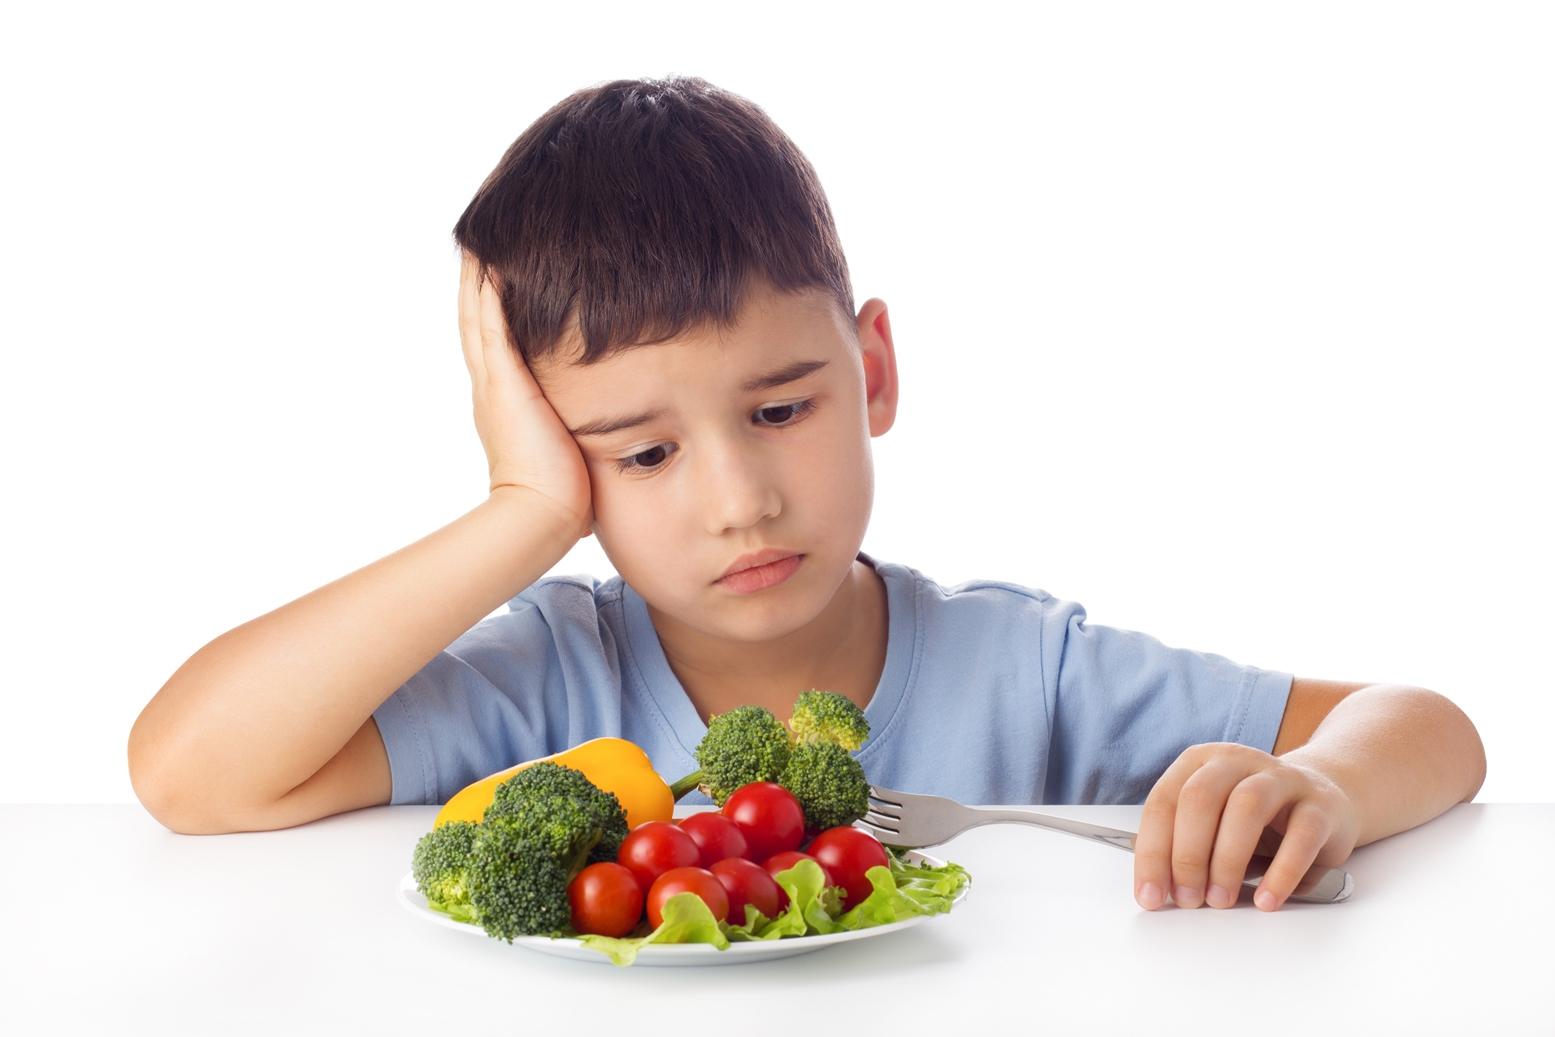 hilangnya nafsu makan anak